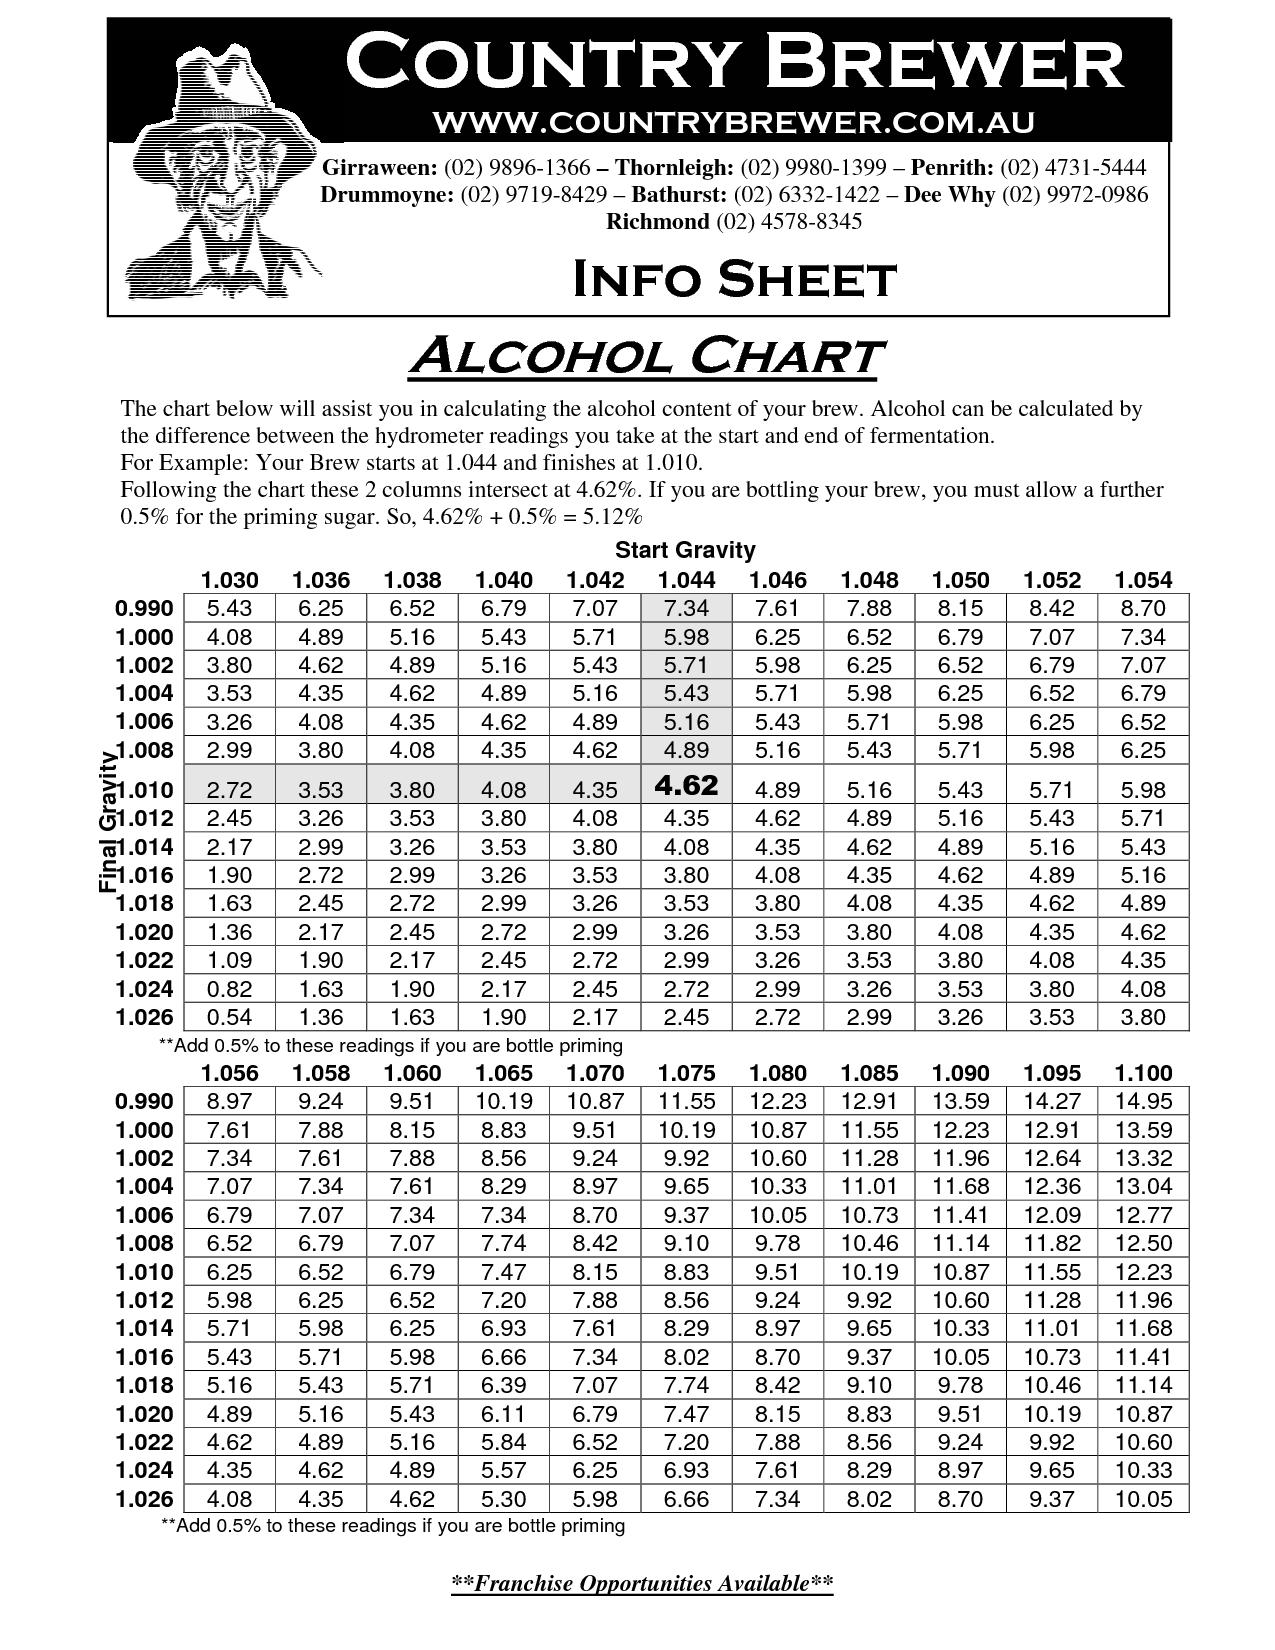 Calculating Alcohol Content